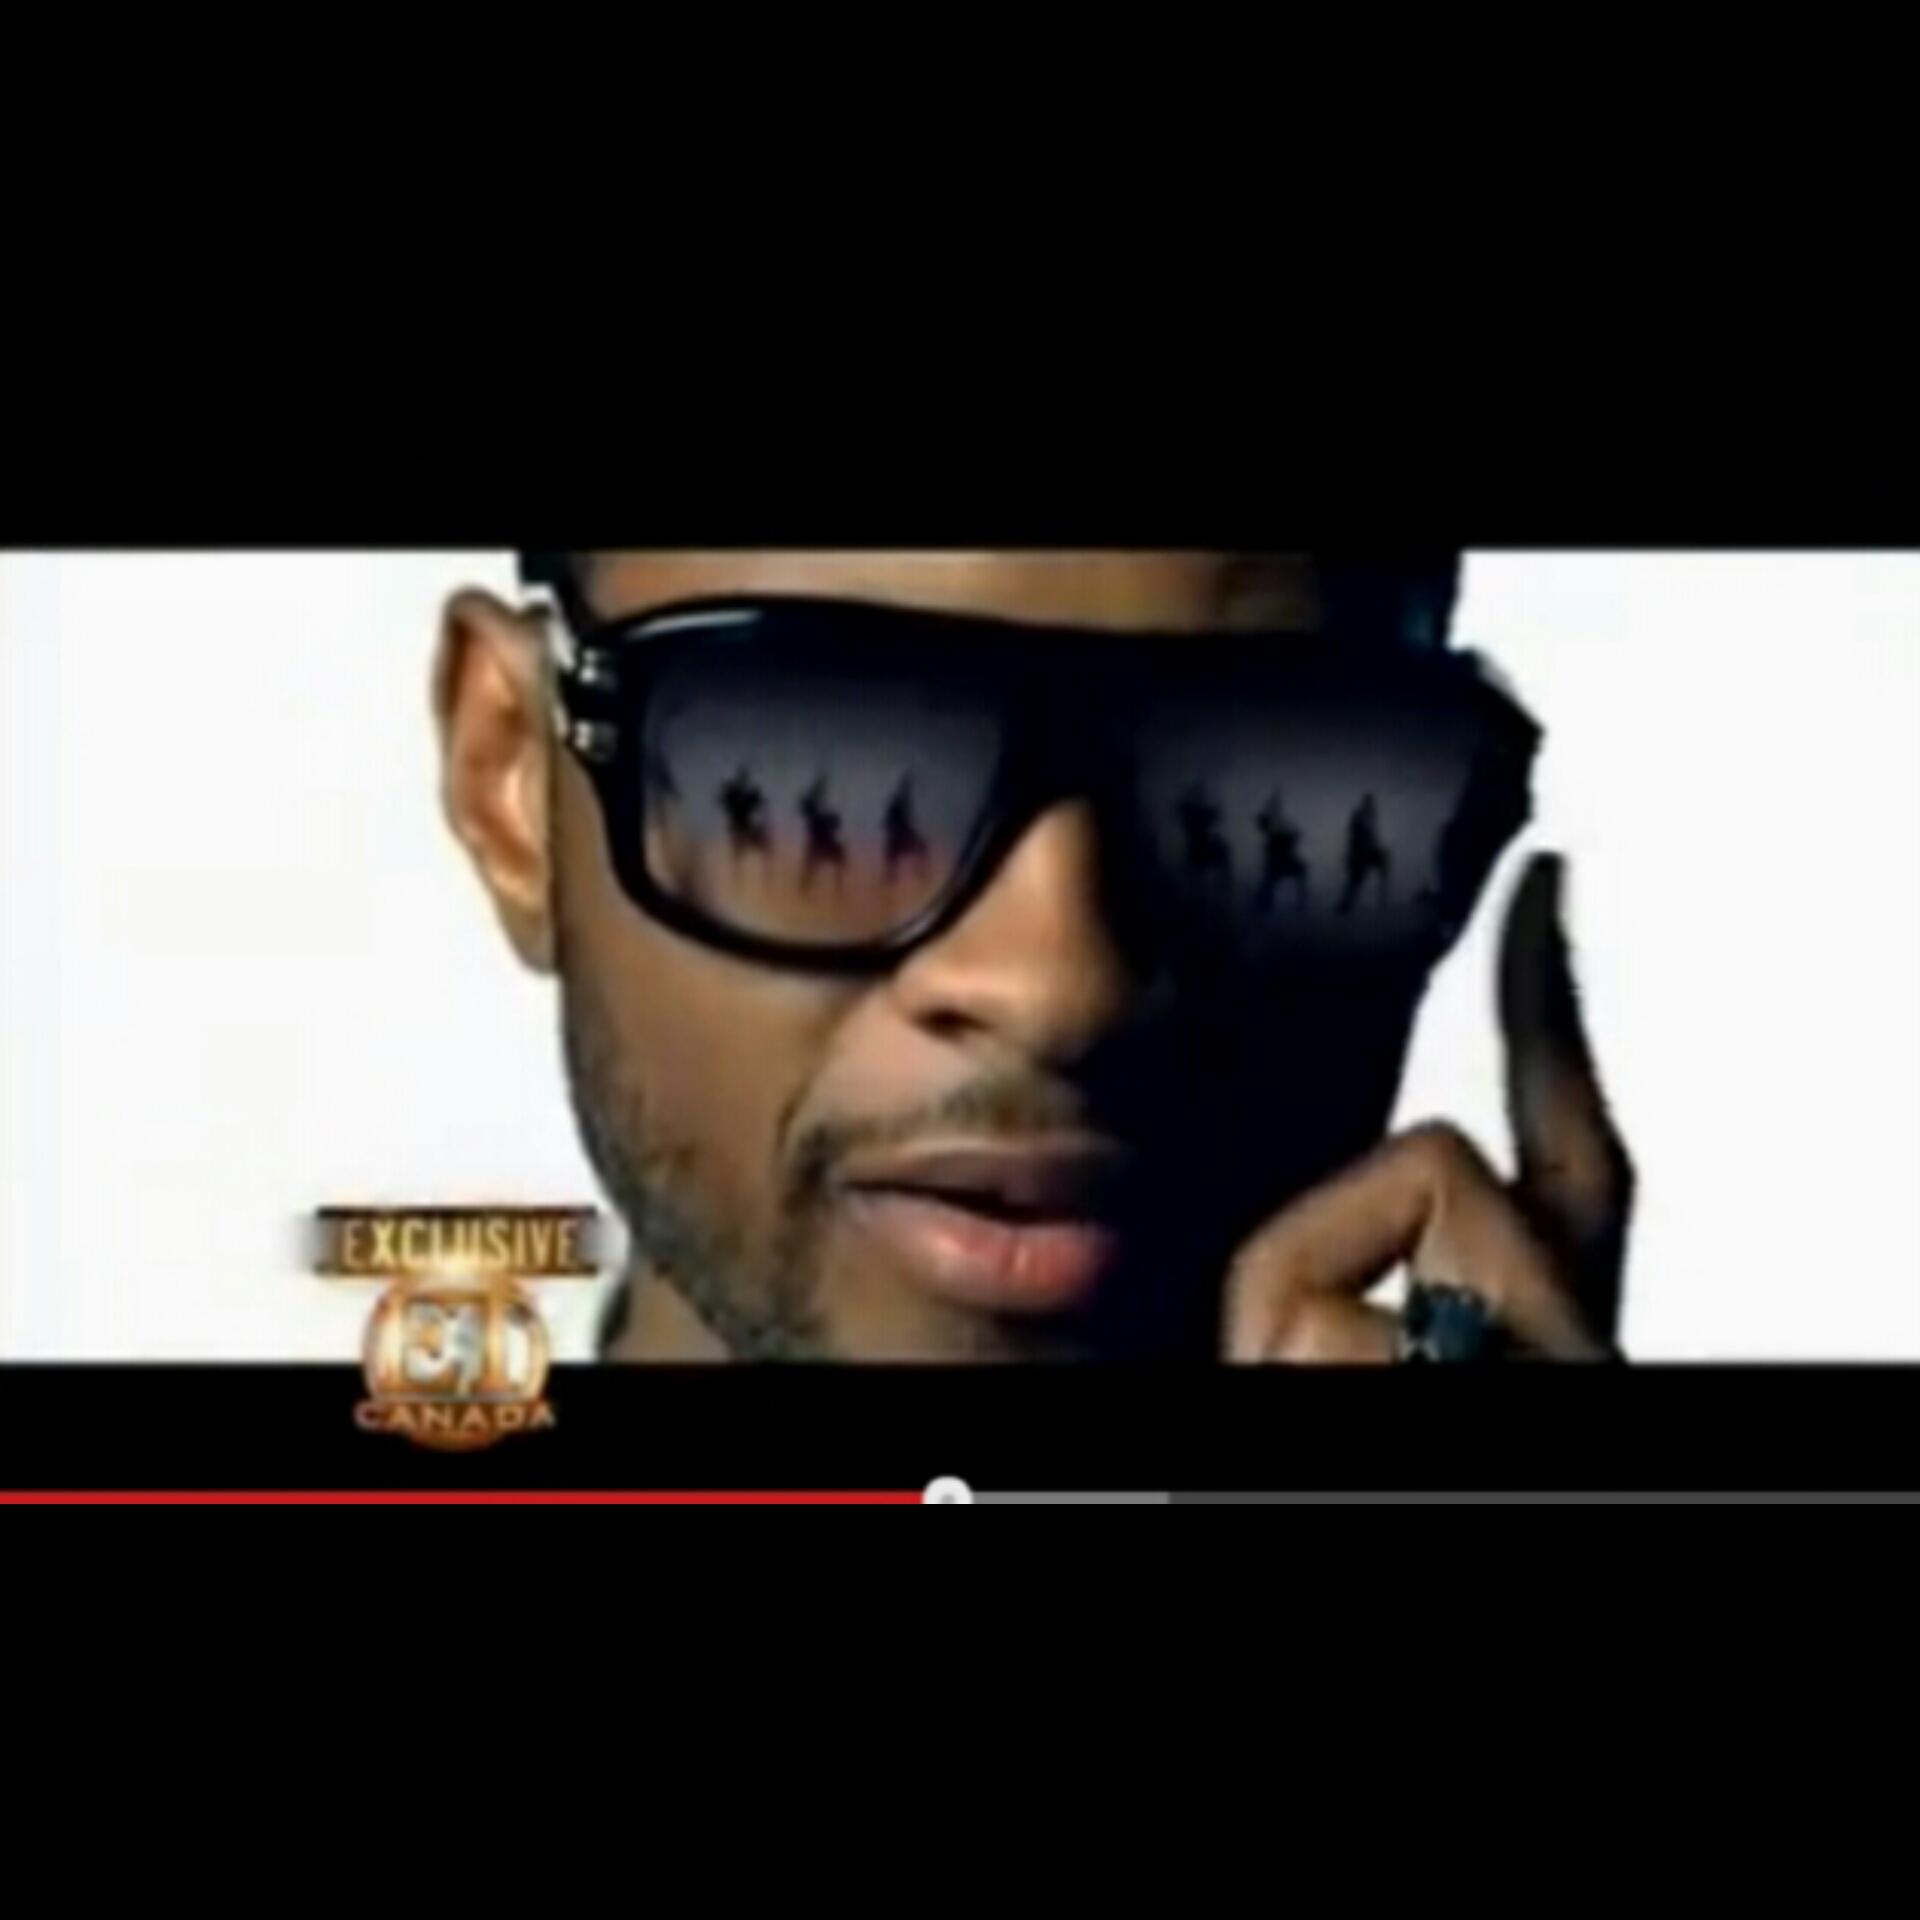 Usher in NYC